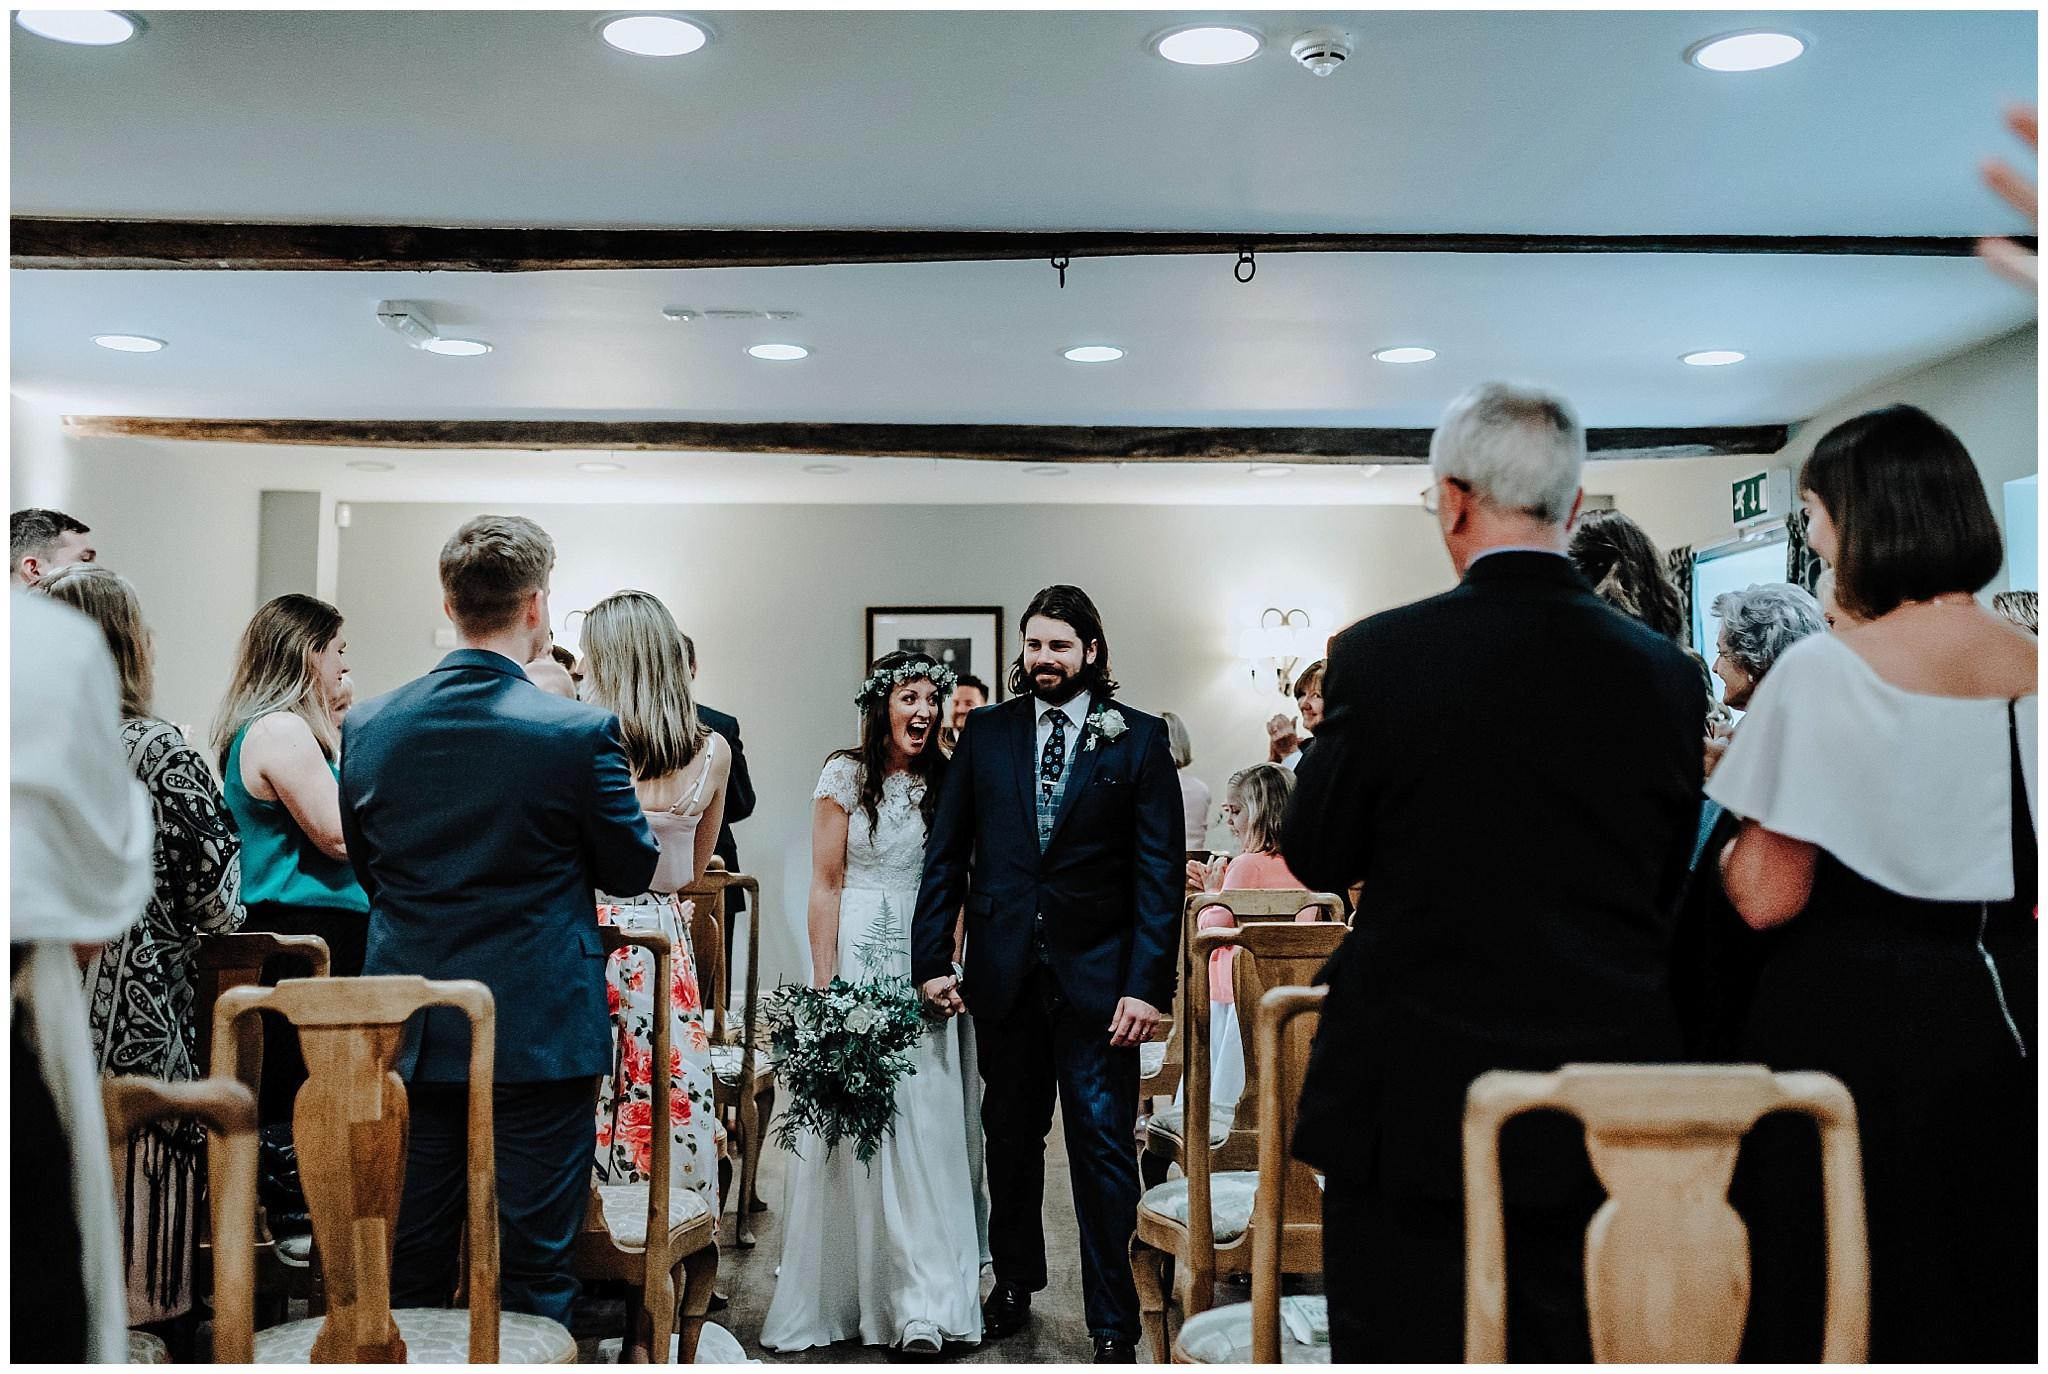 Bride and Groom walking back down the aisle together at Bodnant Welsh Food Centre